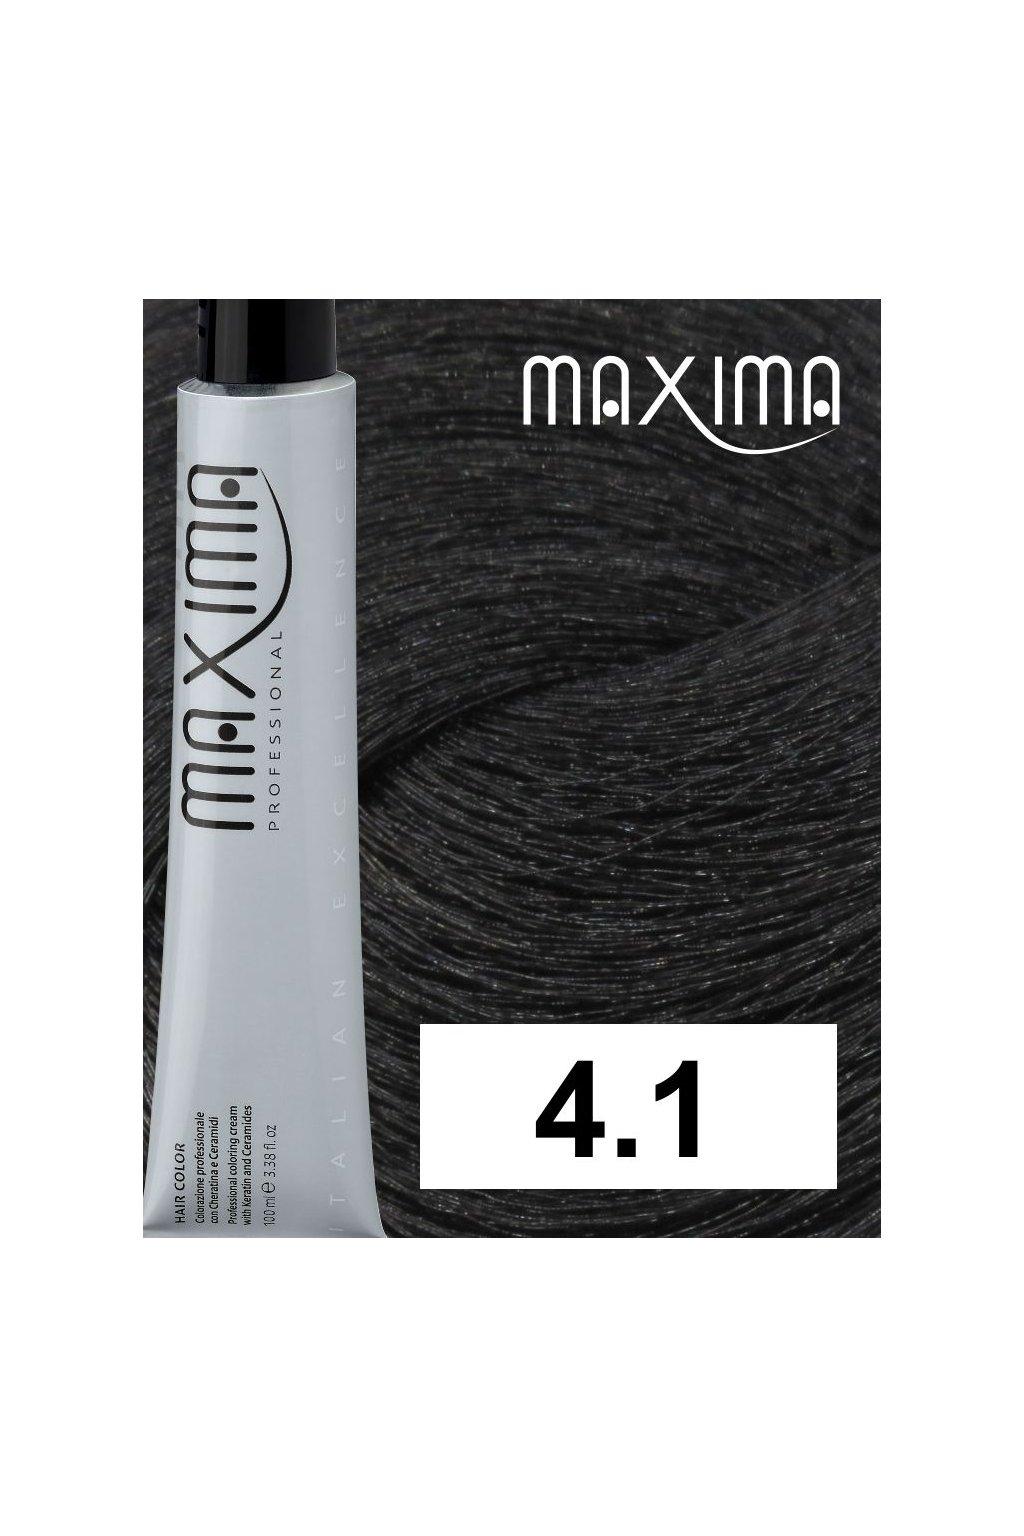 4 1 max